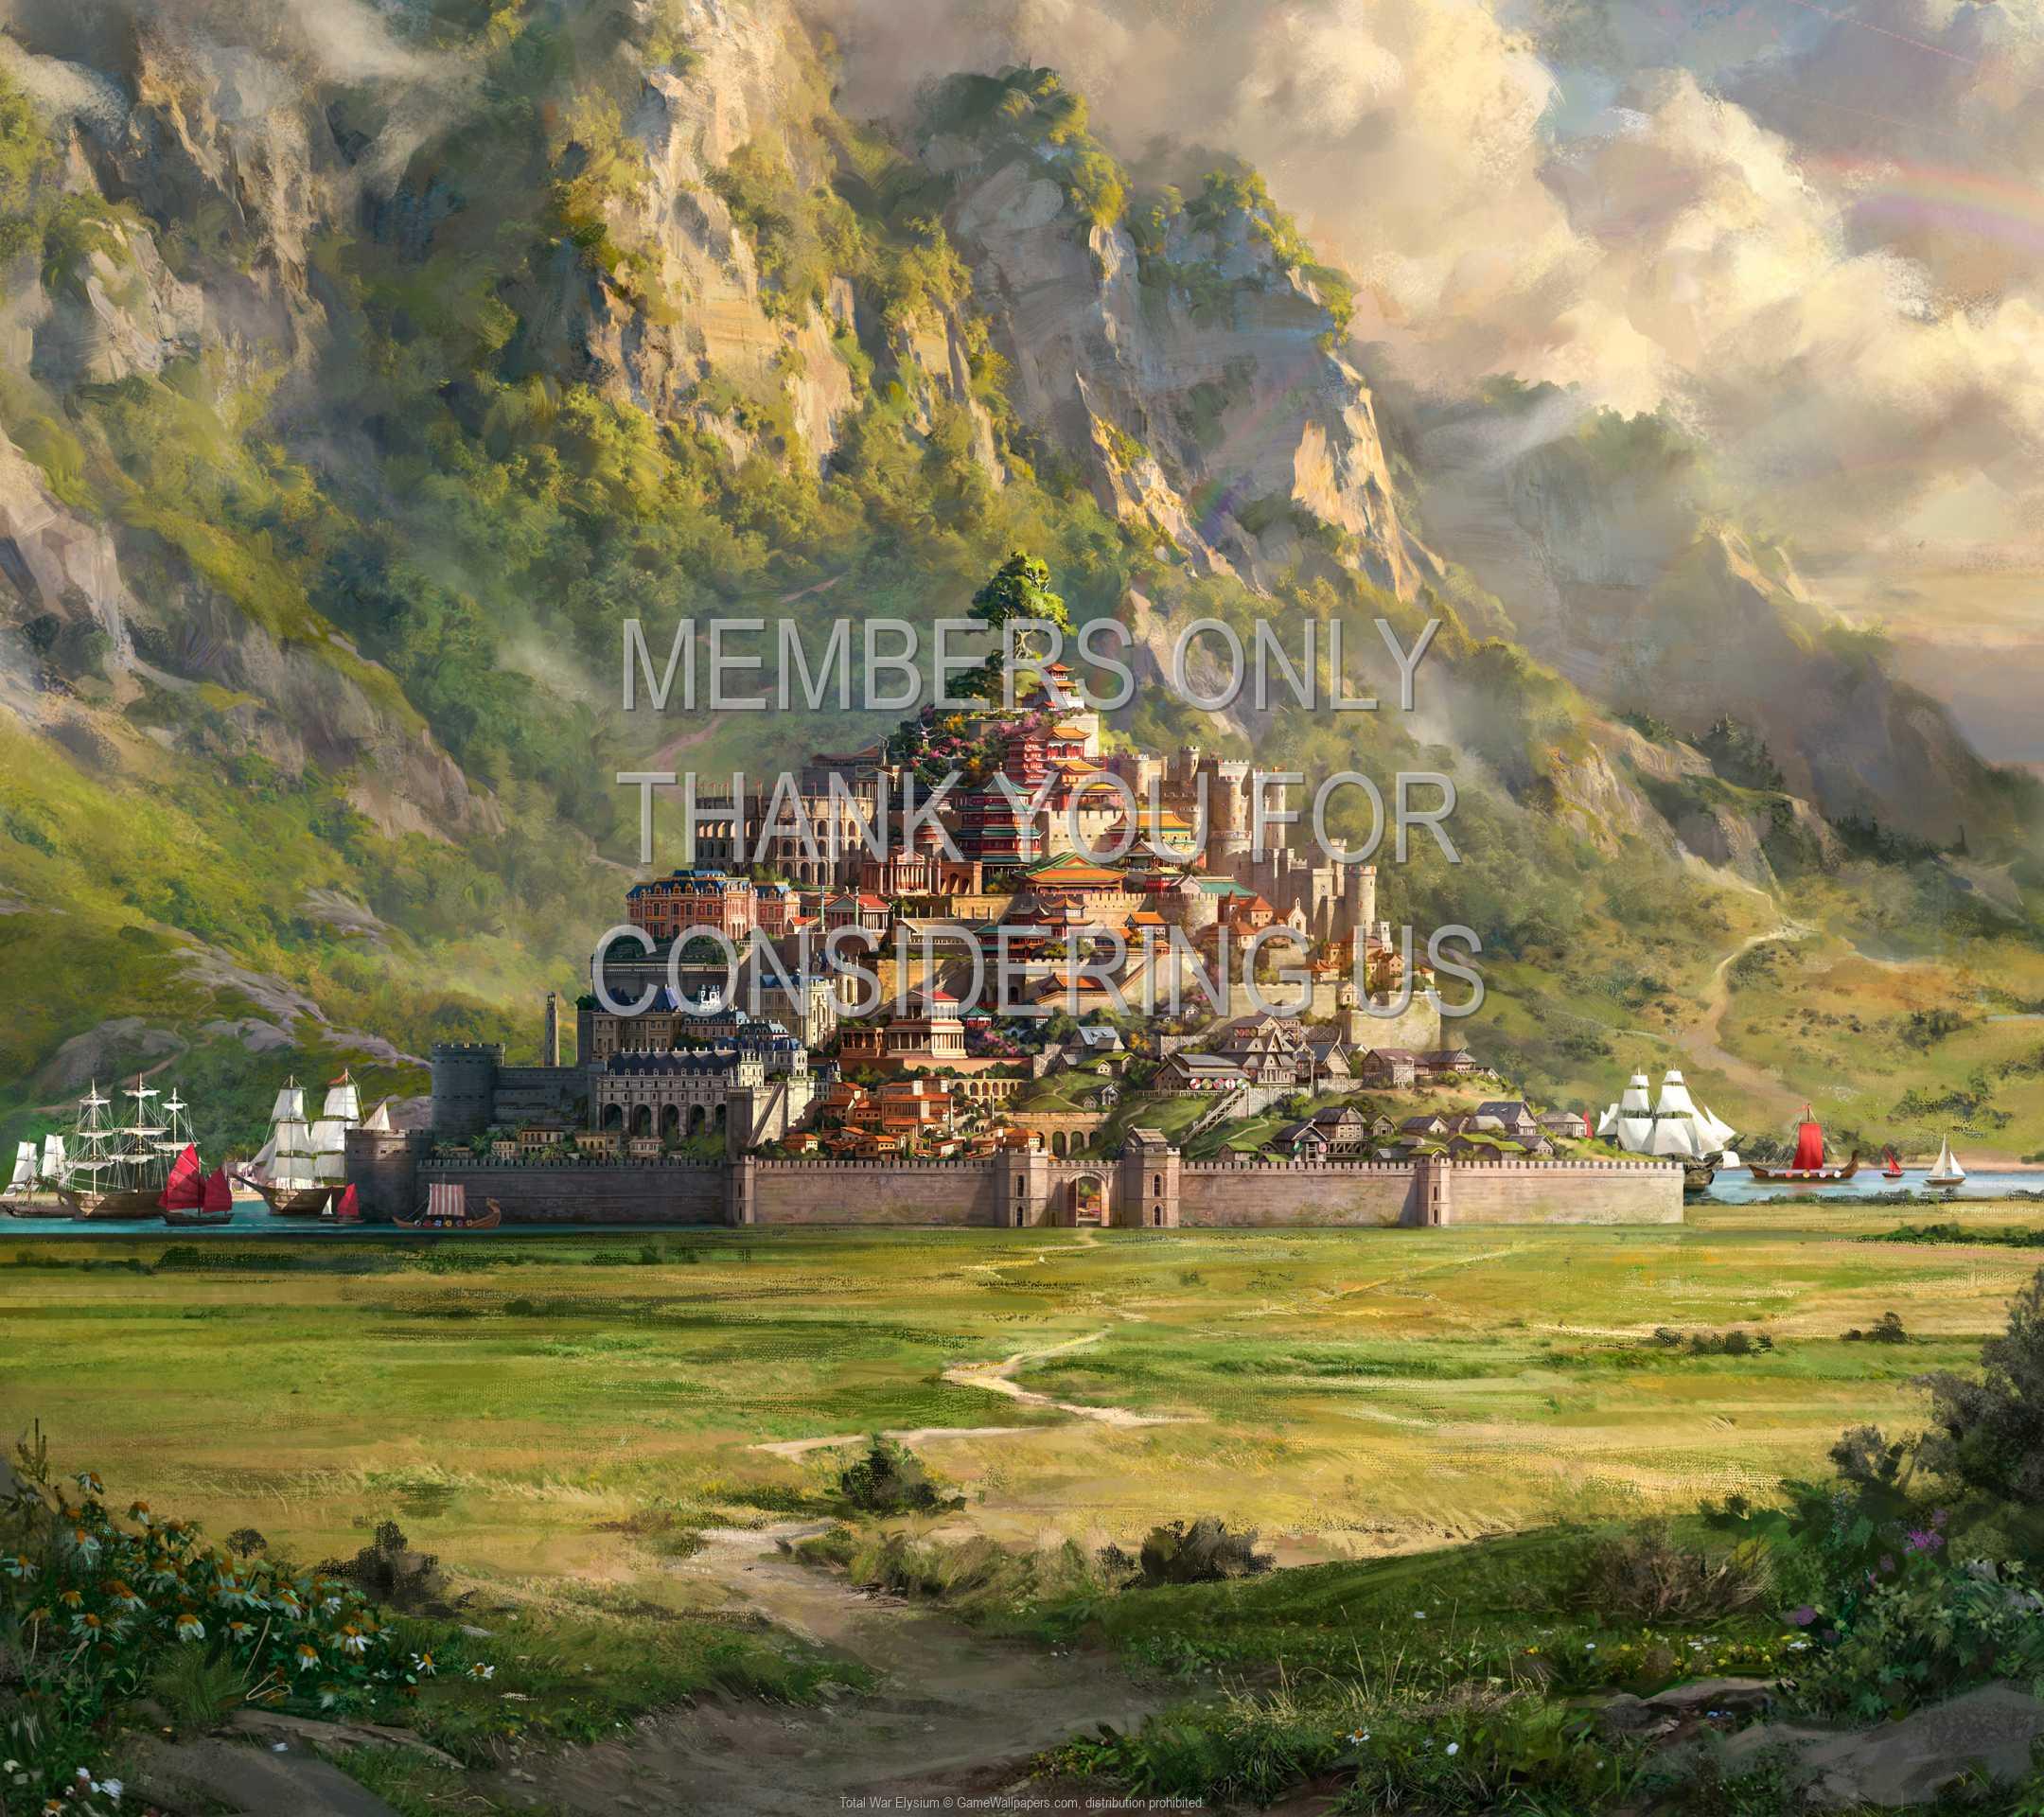 Total War: Elysium 1080p Horizontal Mobile wallpaper or background 02